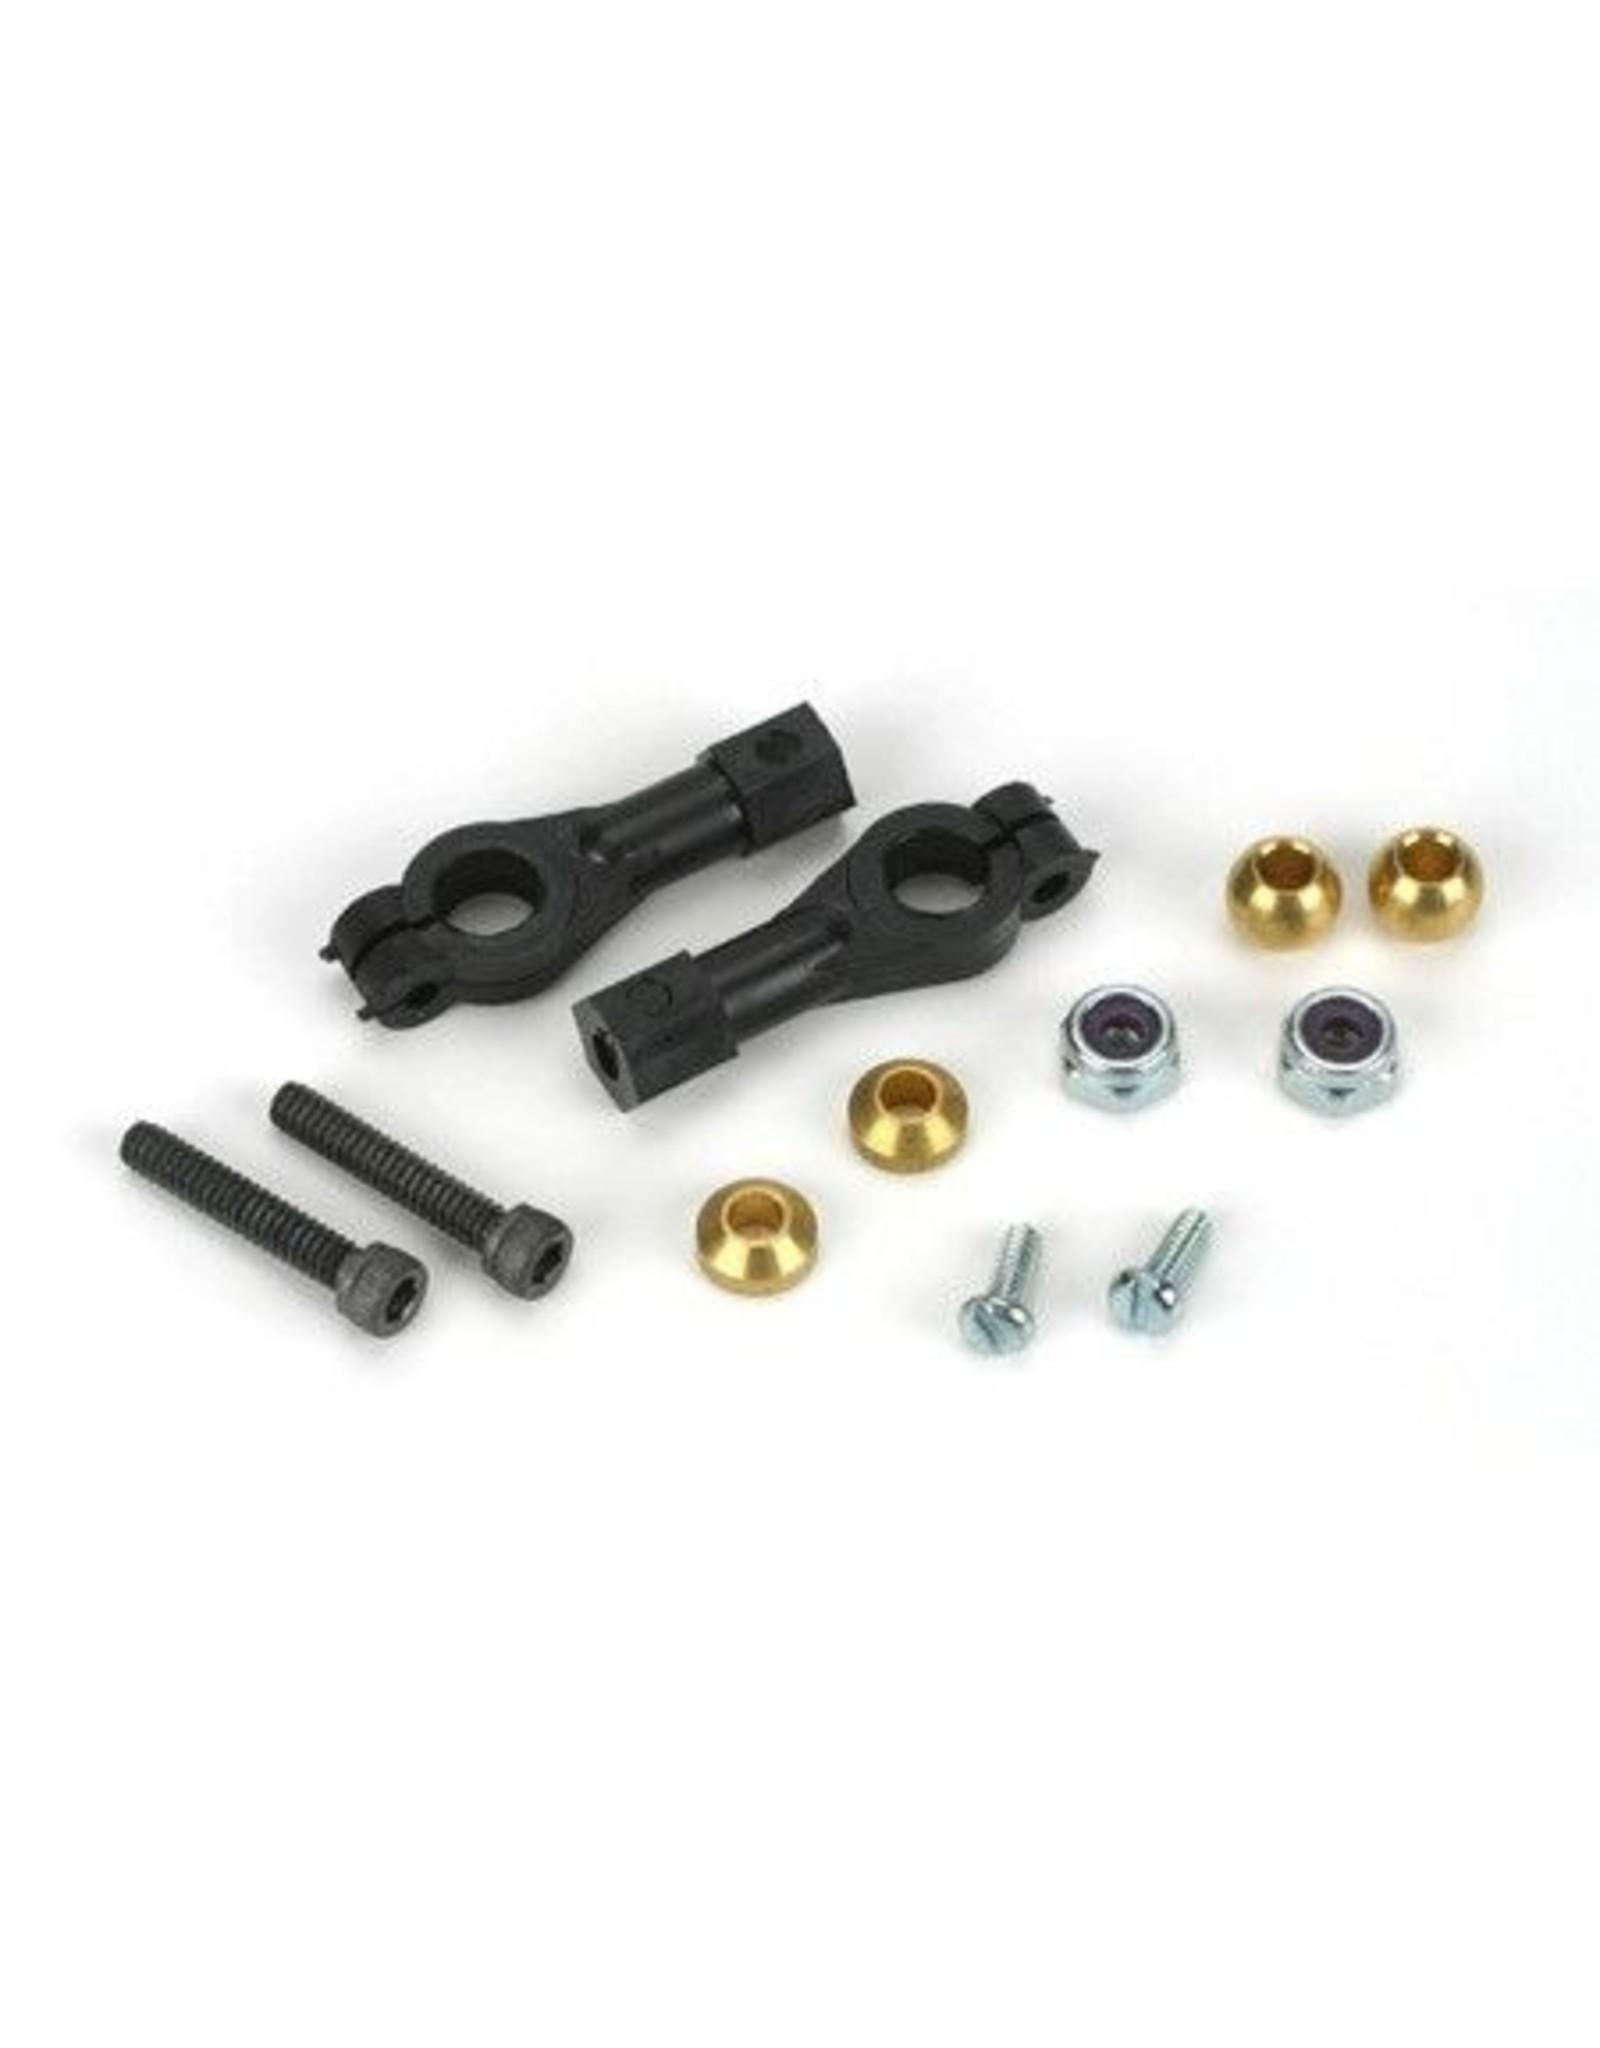 Dubro 2137 - Adjustable Ball Link Hardware, 4-40 - Long